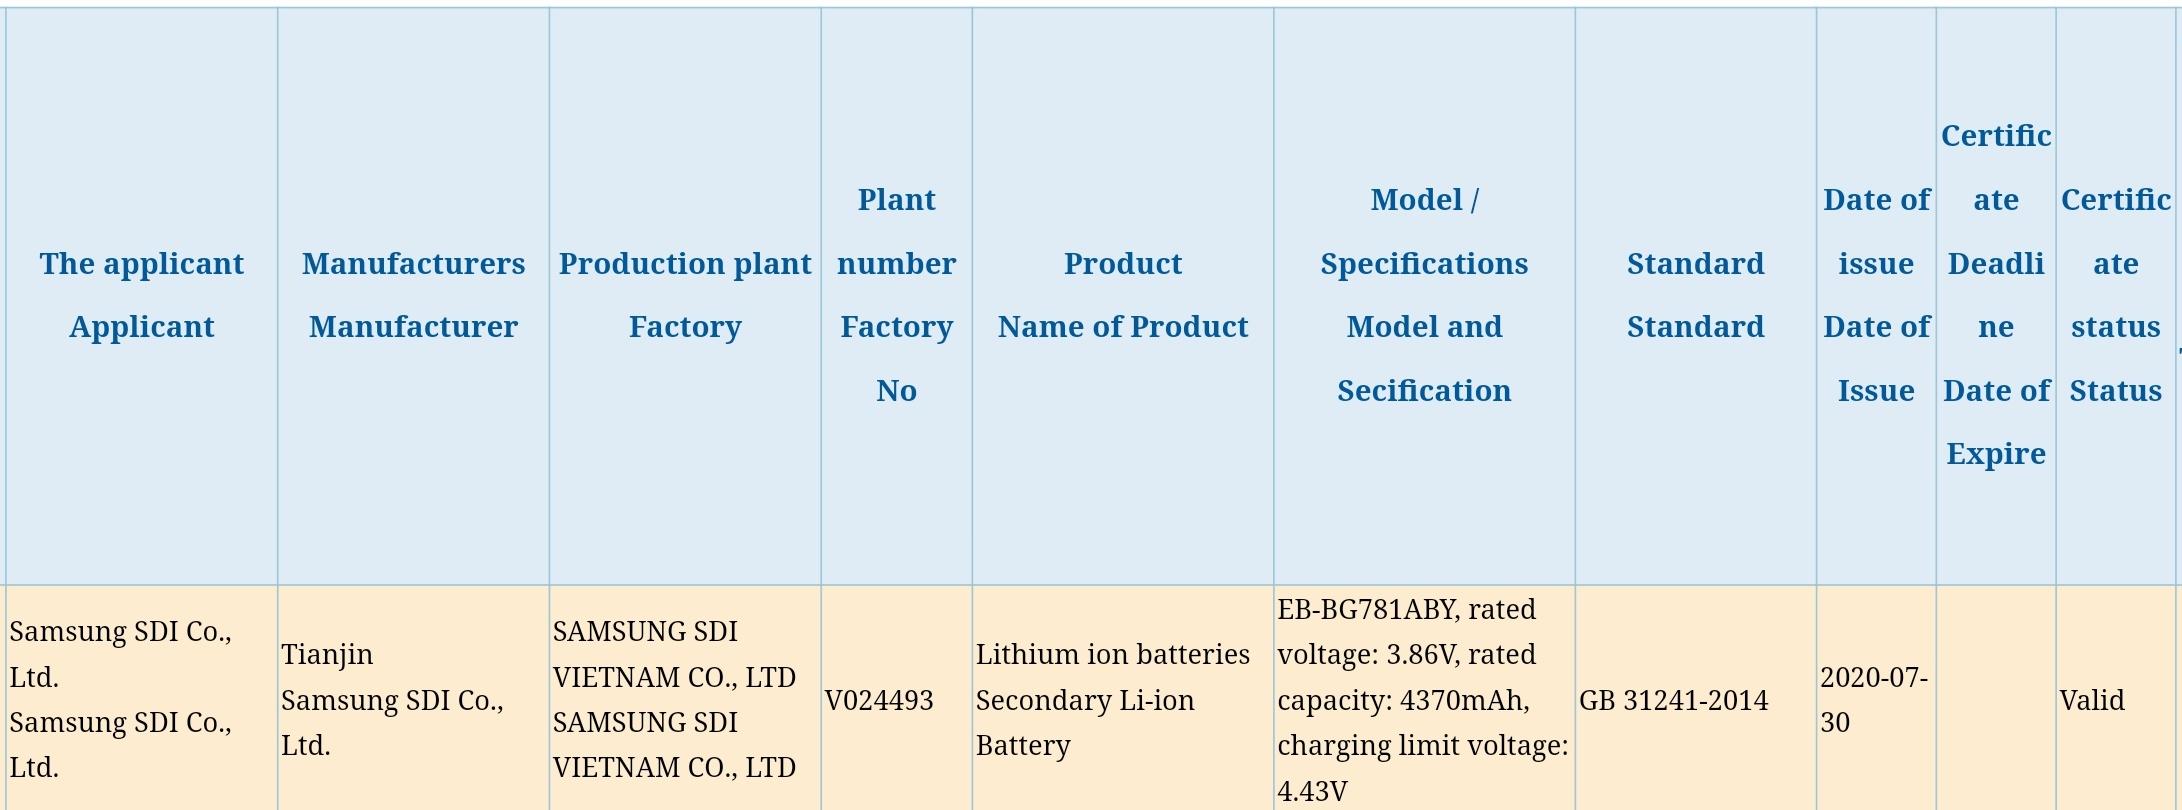 Подтверждена важная характеристика Samsung Galaxy S20 Lite Samsung  - podtverzhdena_odna_iz_vazhnyh_harakteristik_samsung_galaxy_s20_lite_picture2_0